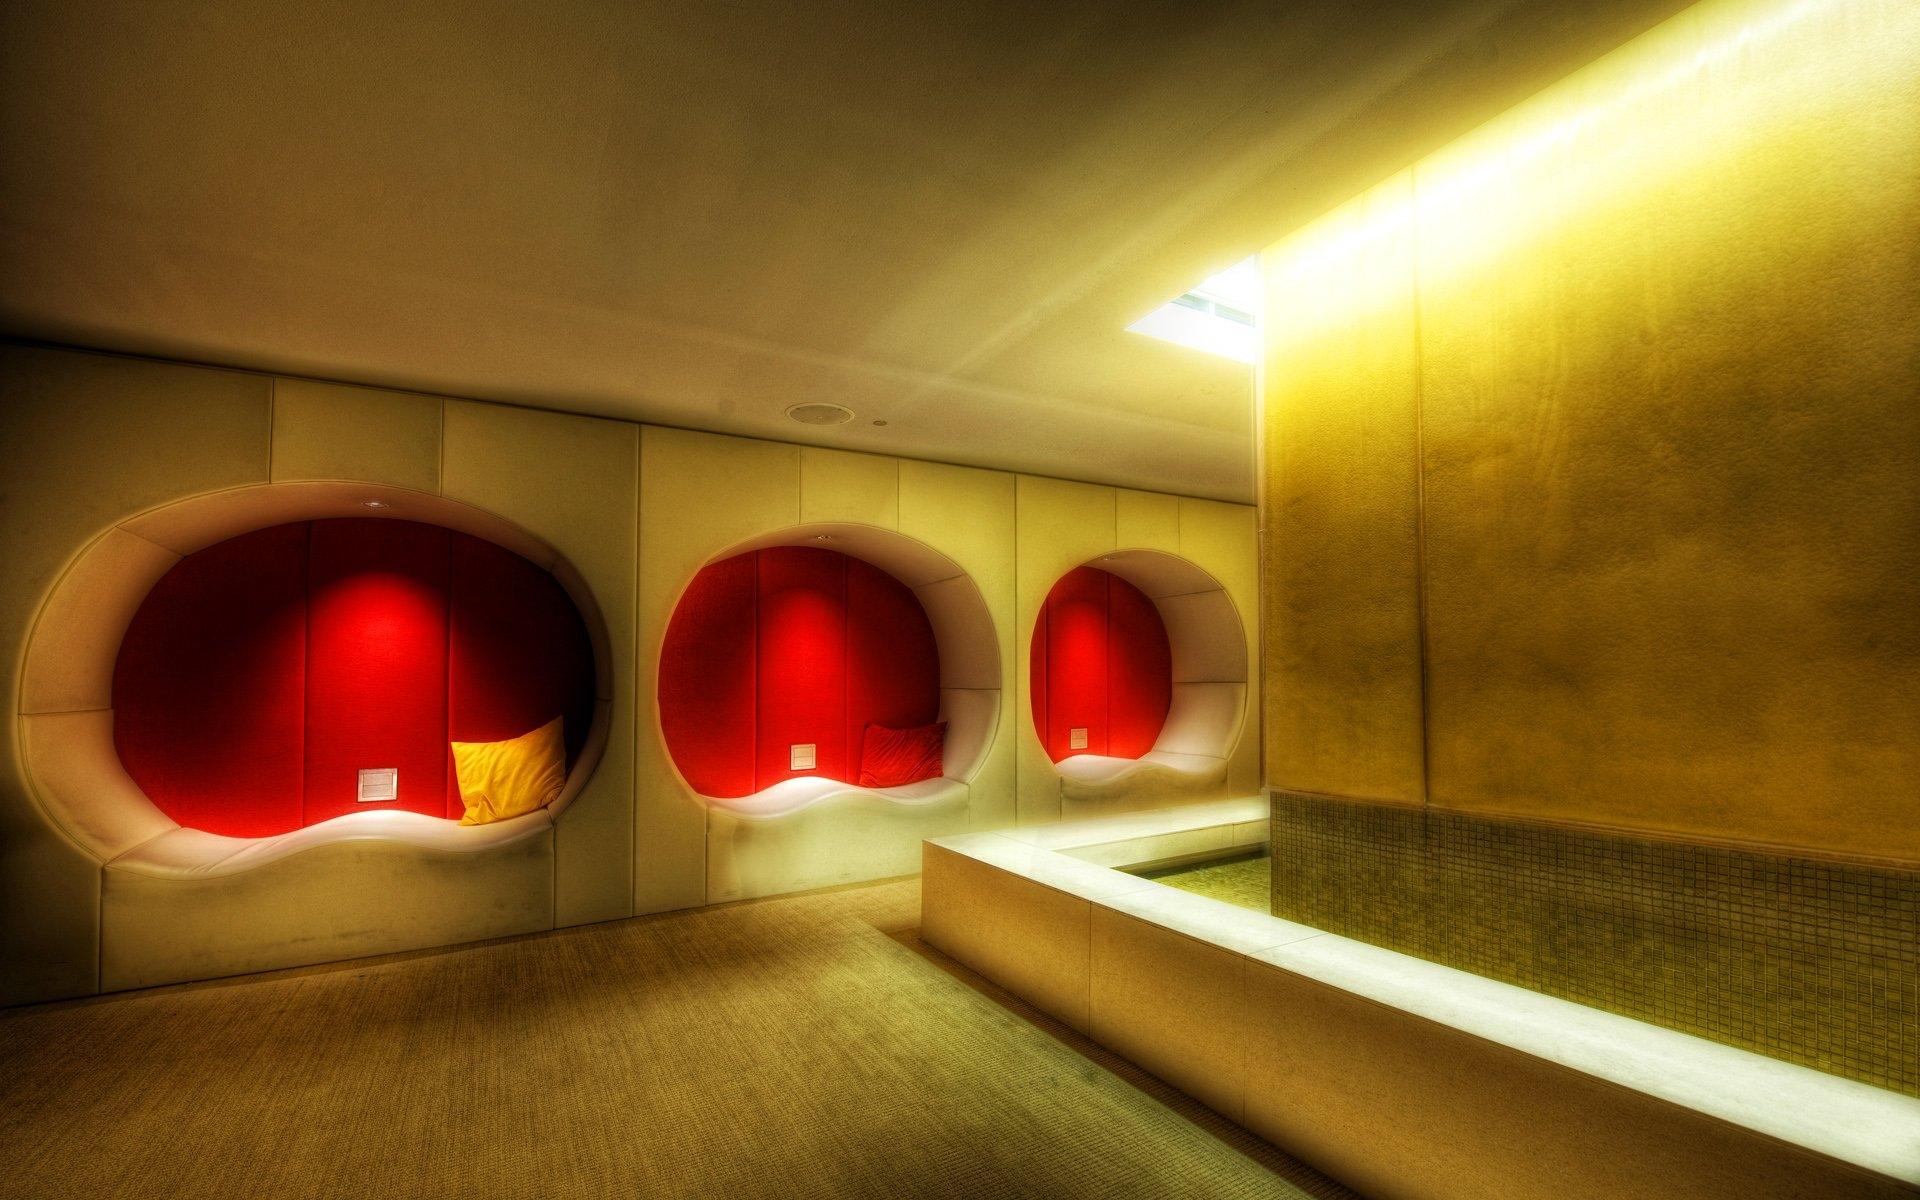 Wallpaper : night, red, wall, yellow, modern, interior design, light ...